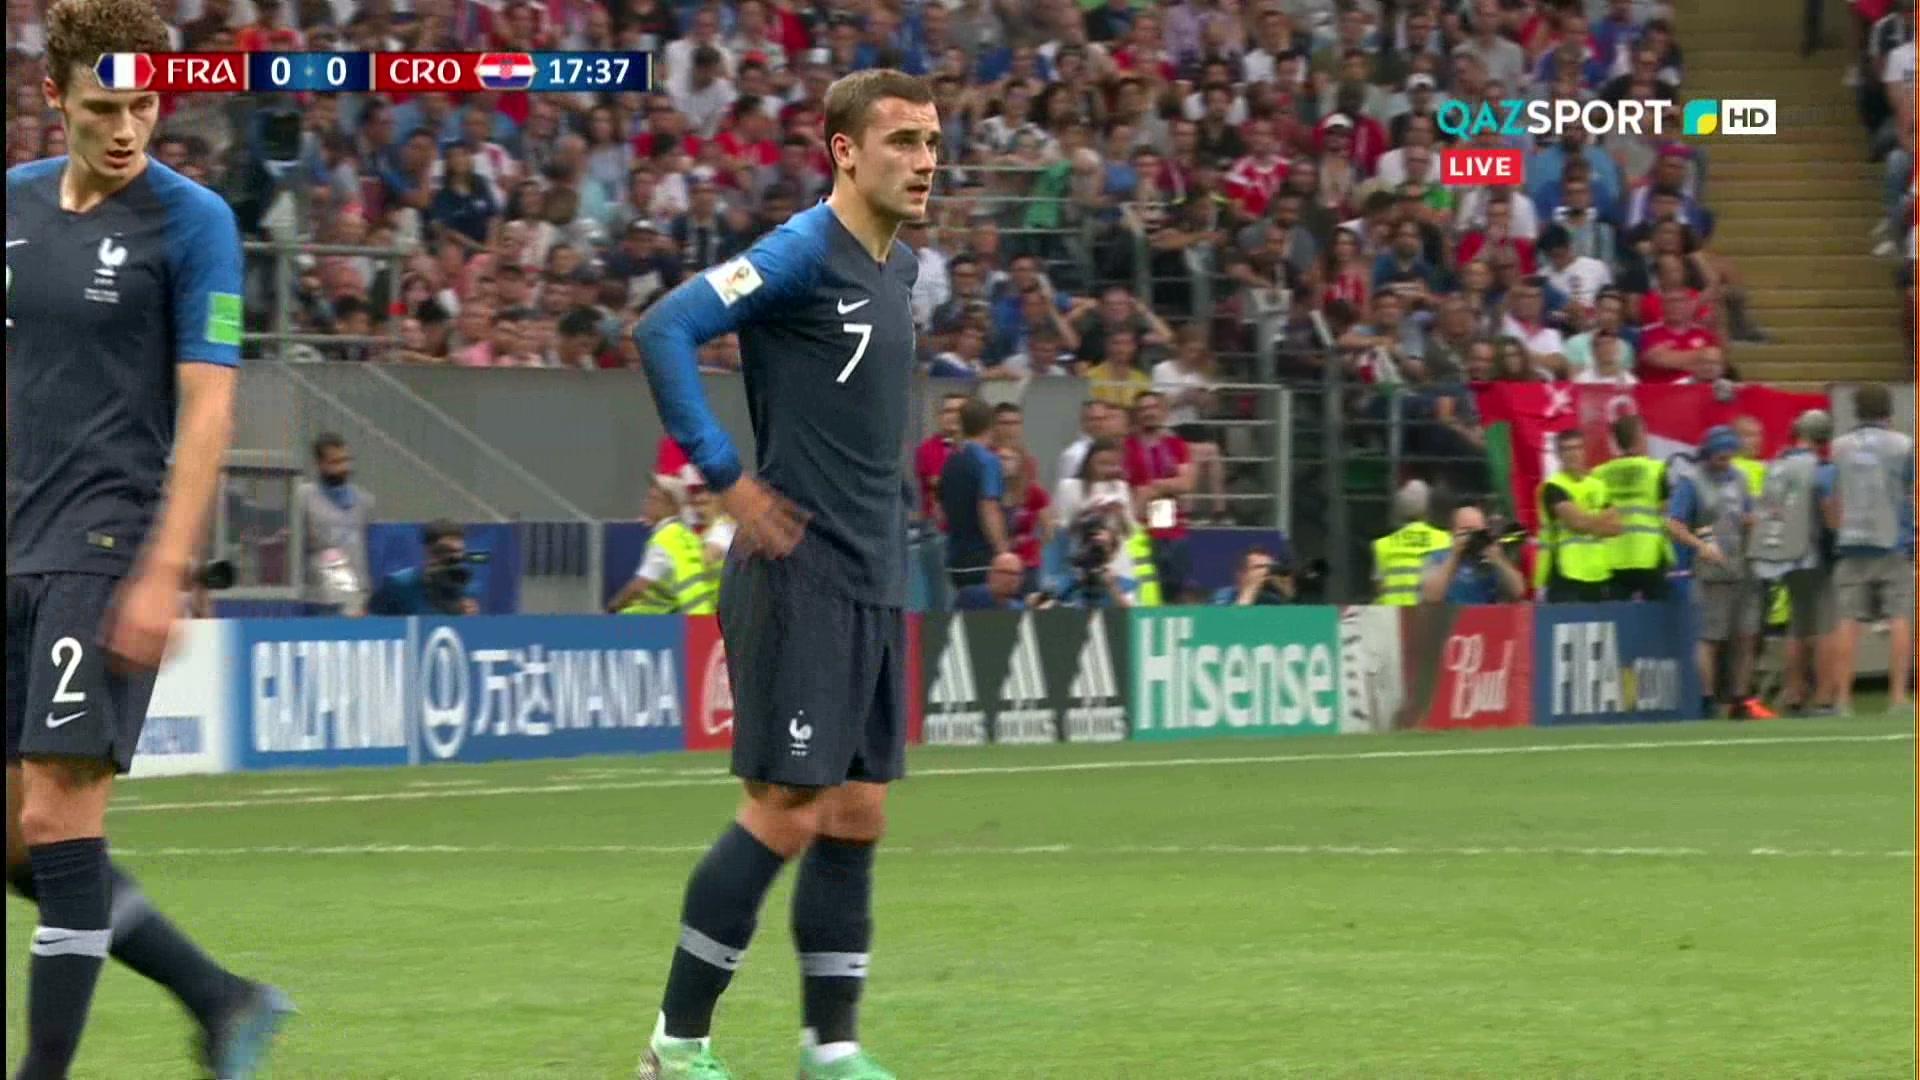 Франция 4:2 Хорватия | Чемпионат Мира 2018 | Обзор матча